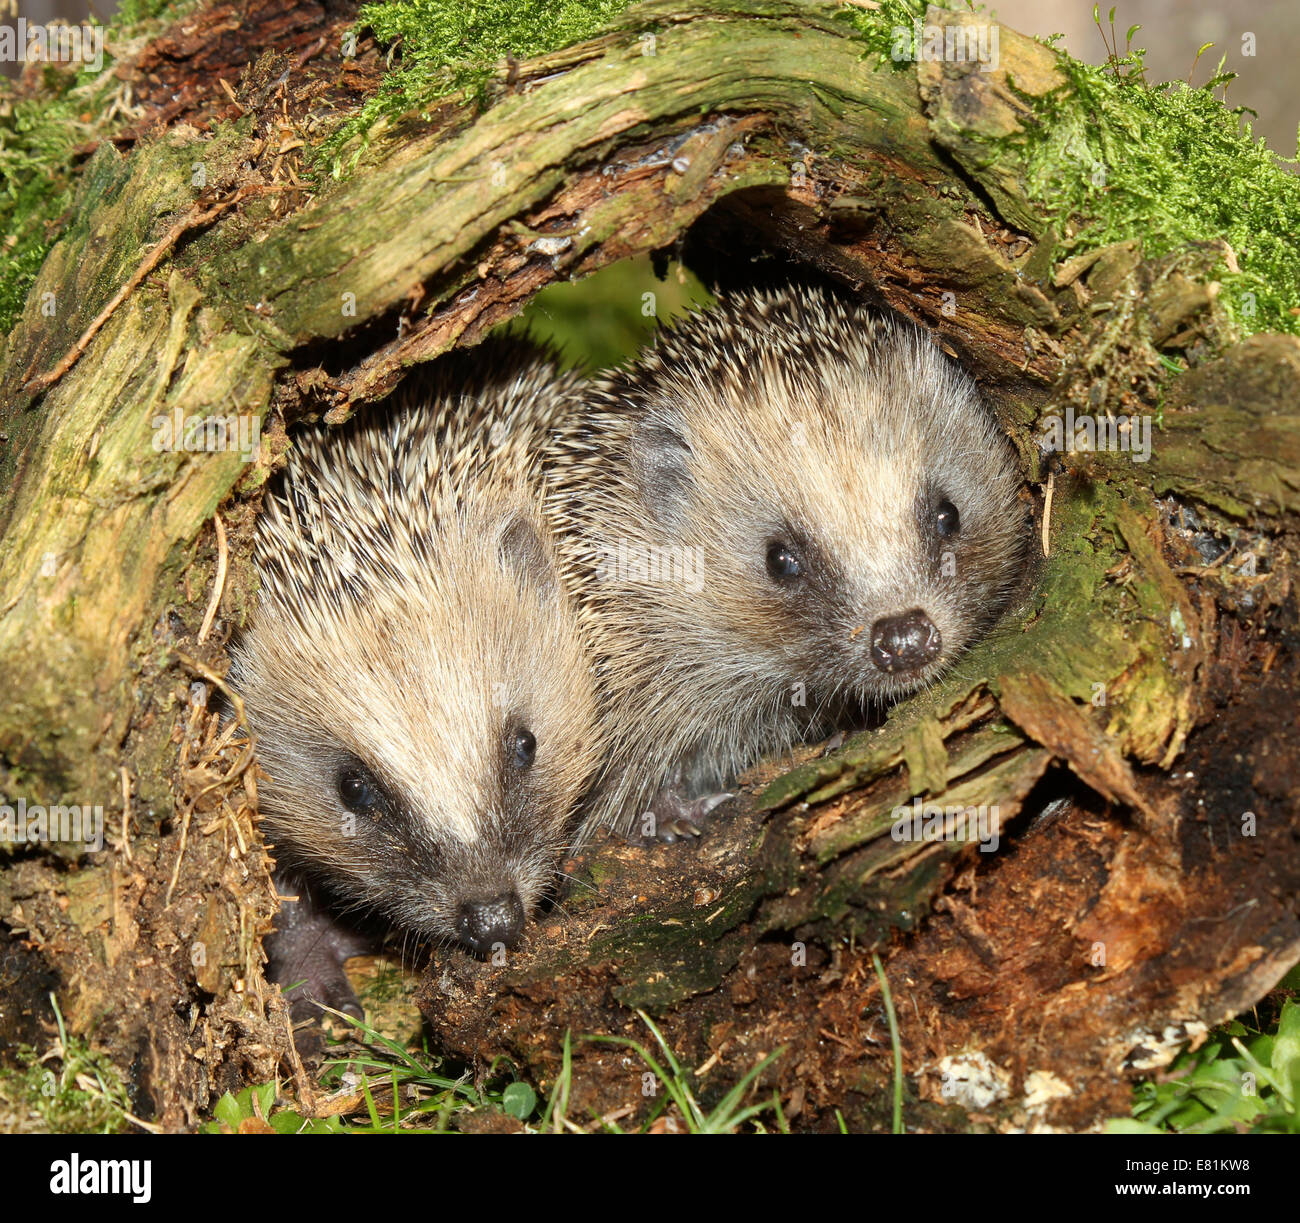 Hedgehog (Erinaceus europaeus), young animals in old tree stump, Allgäu, Bavaria, Germany, - Stock Image